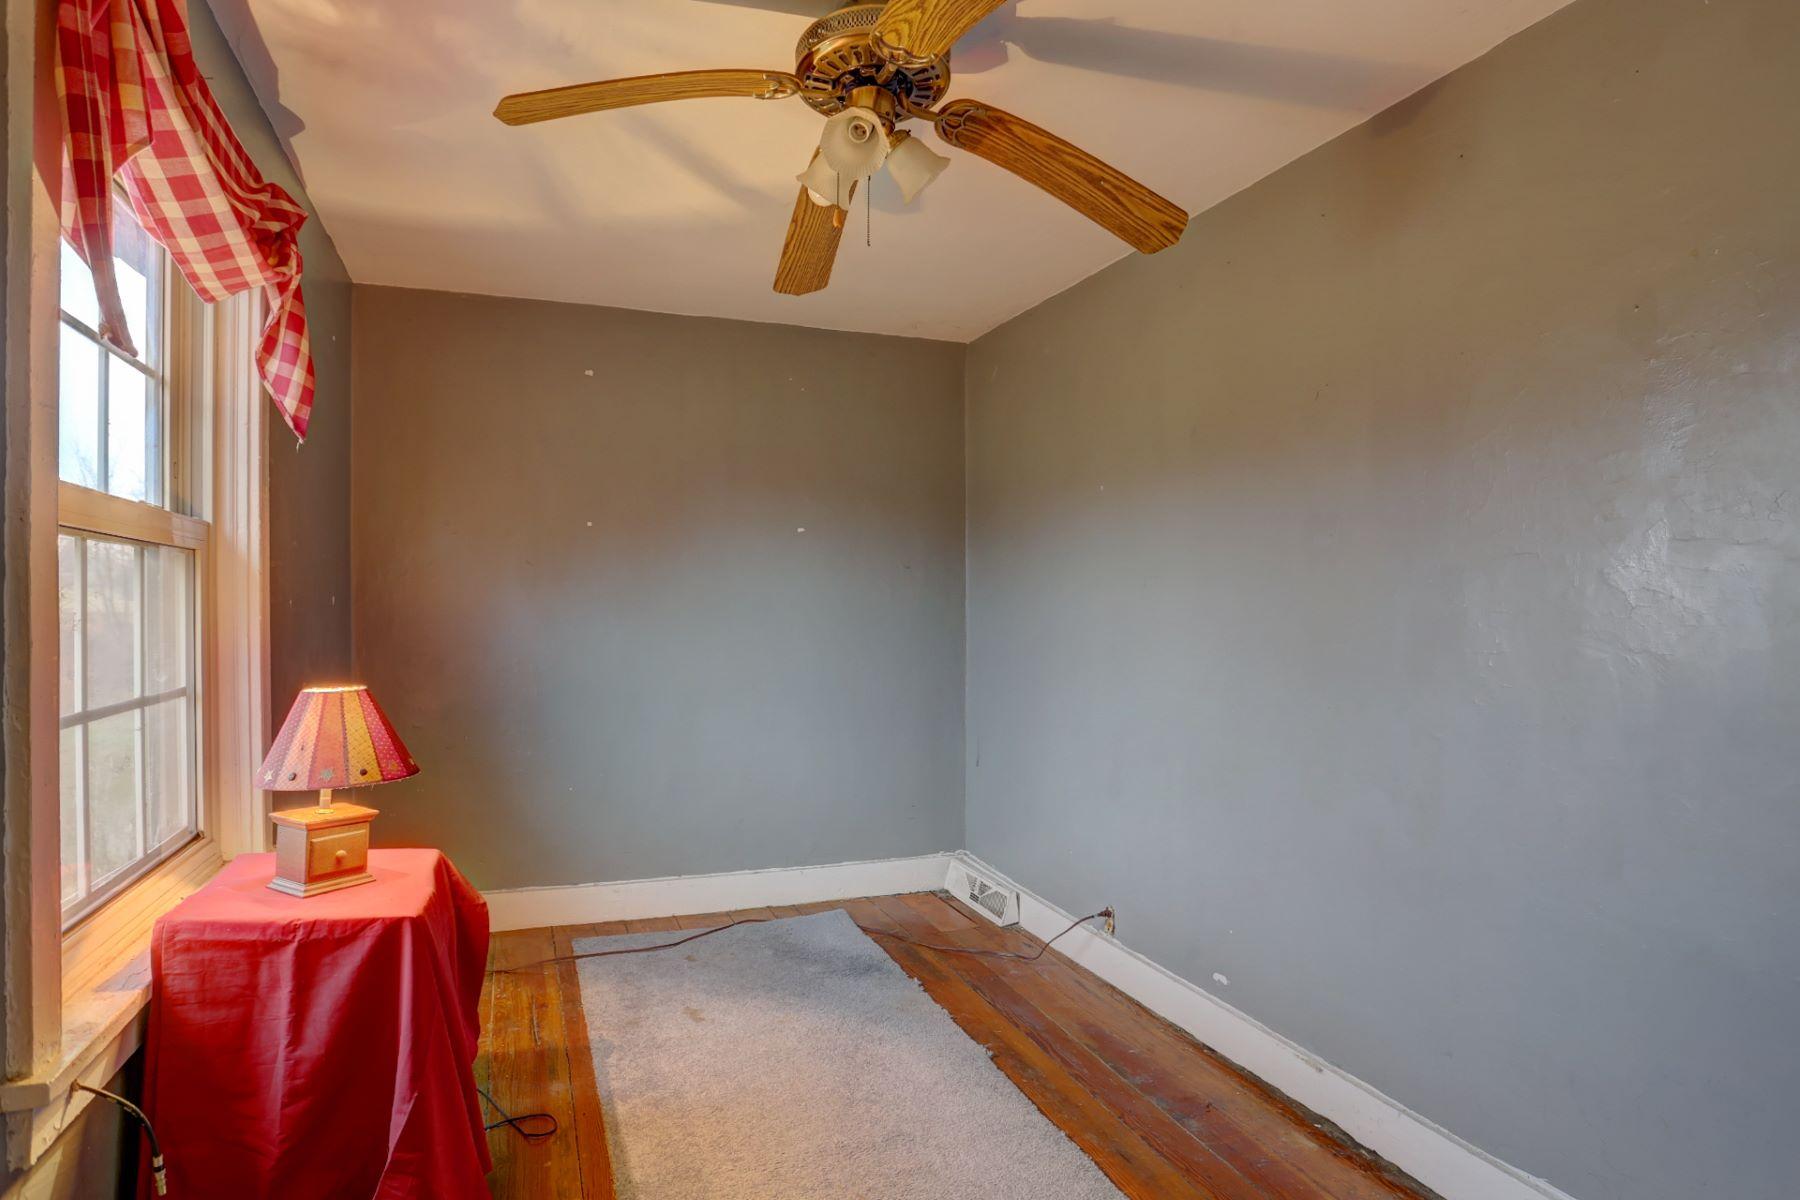 Additional photo for property listing at 378 Hoods Lane  West Grove, Pennsylvania 19390 Estados Unidos